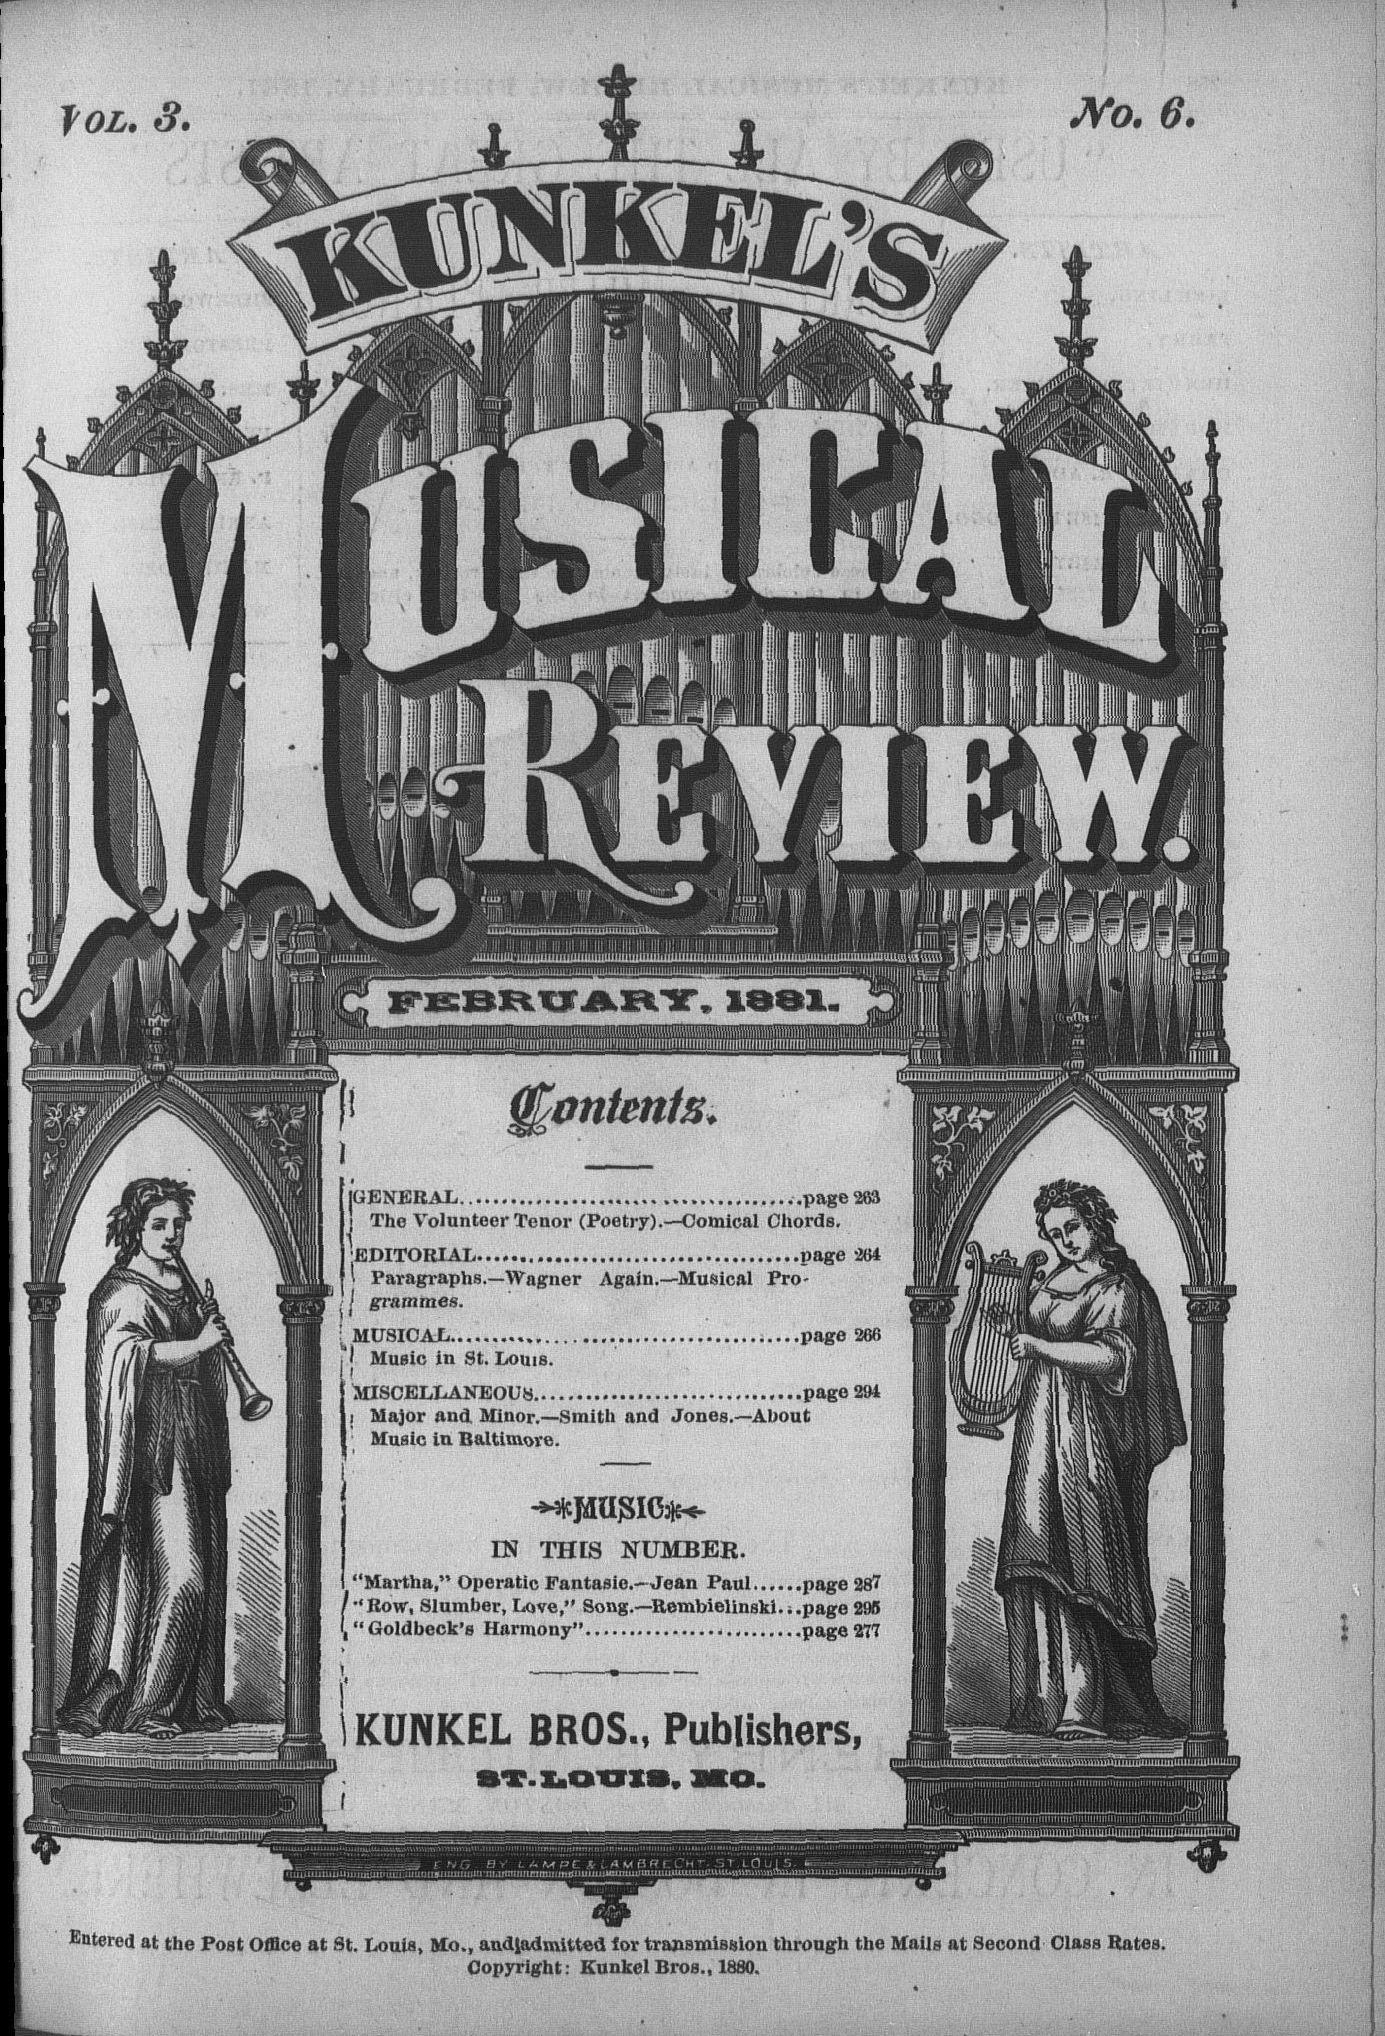 Kunkel's Musical Review, Vol  III, no  6, February, 1881 | Alexander